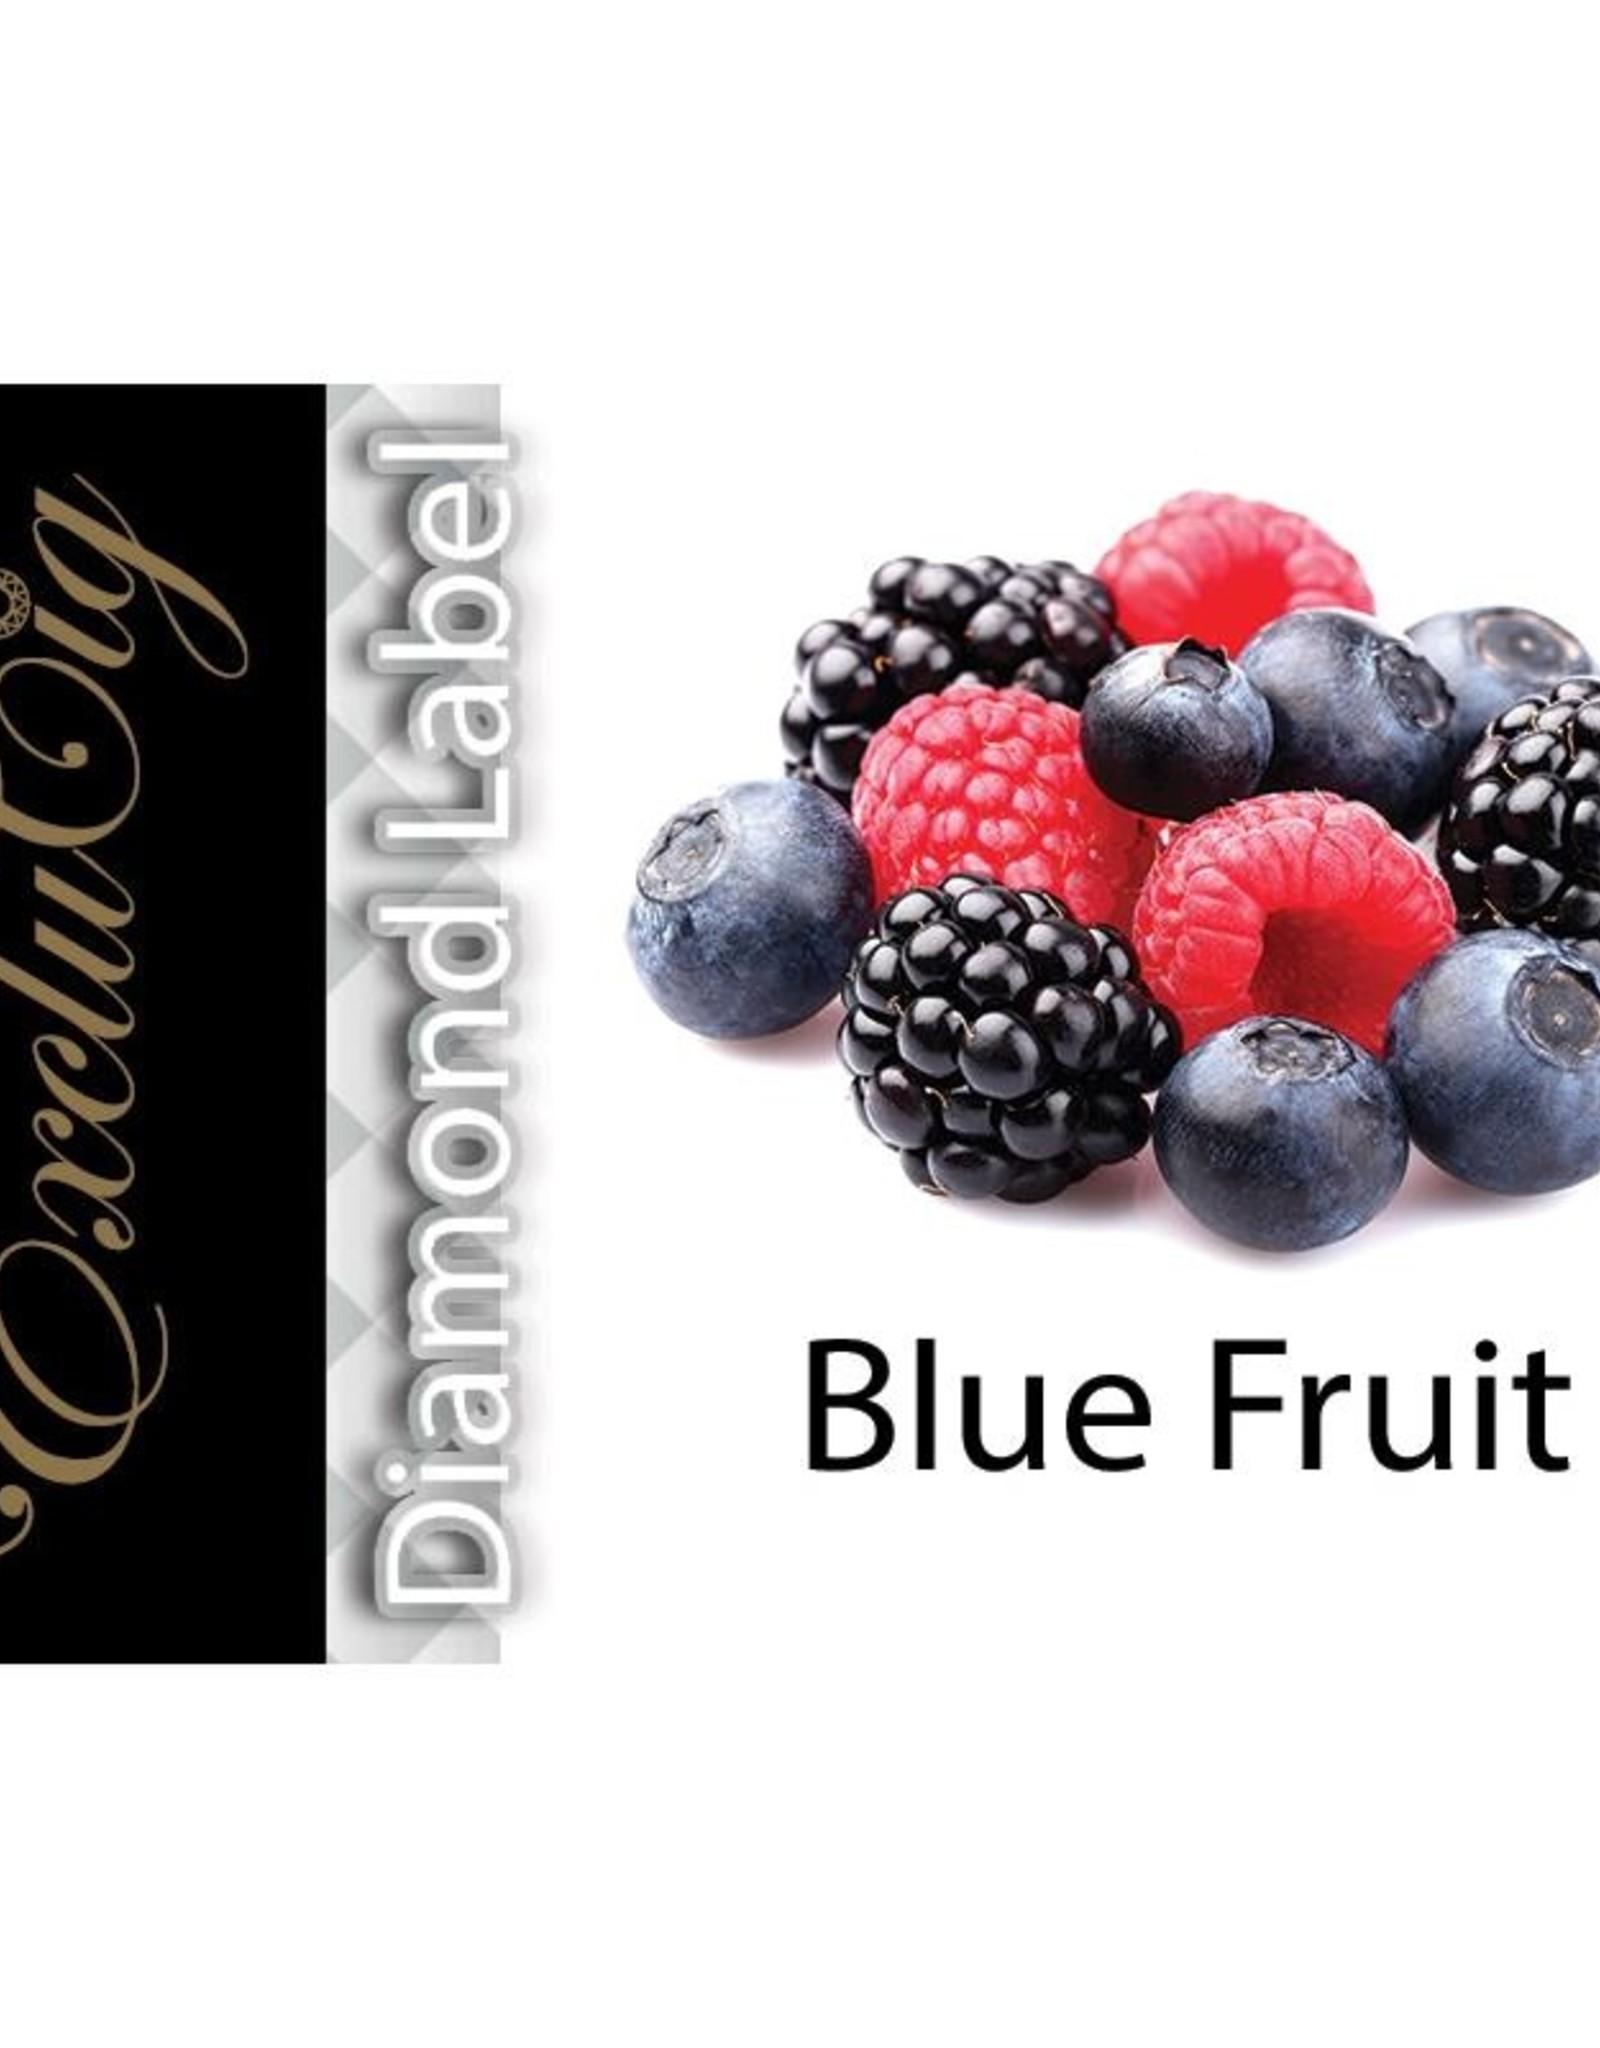 Exclucig Exclucig Diamond Label E-liquid Blue Fruit 3 mg Nicotine